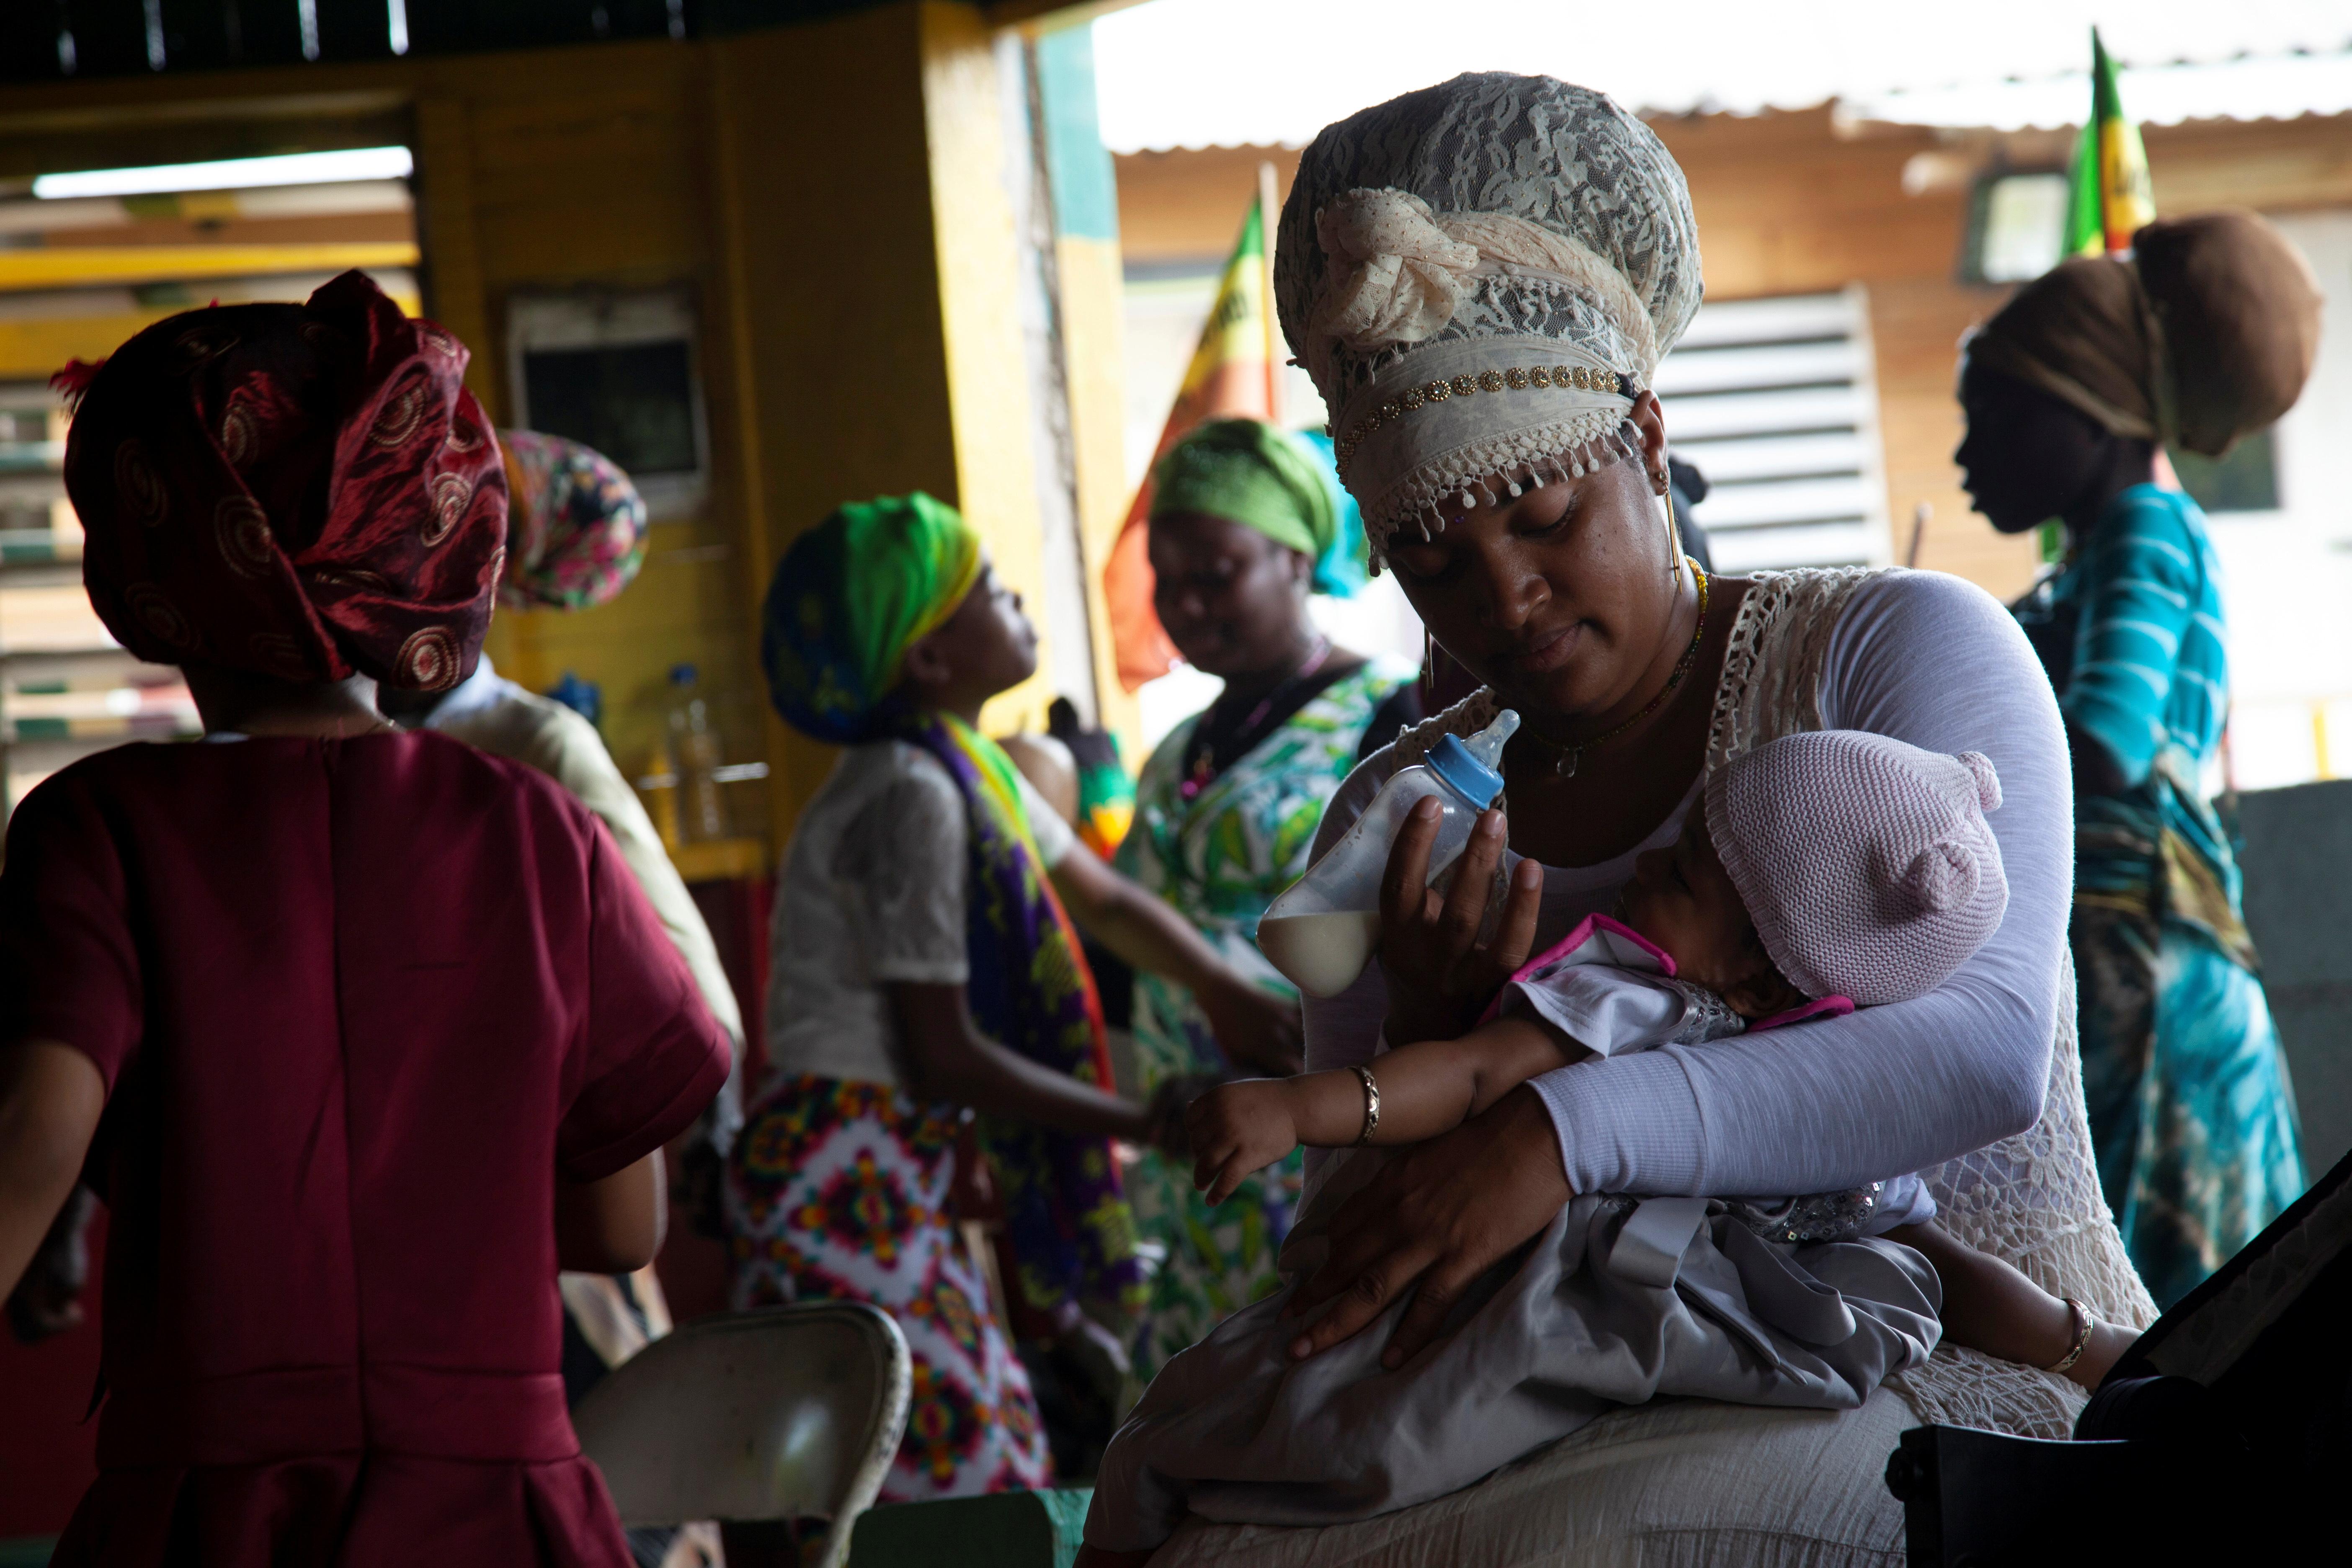 Rastafari distrust of Western medicine contributes to Jamaica vac